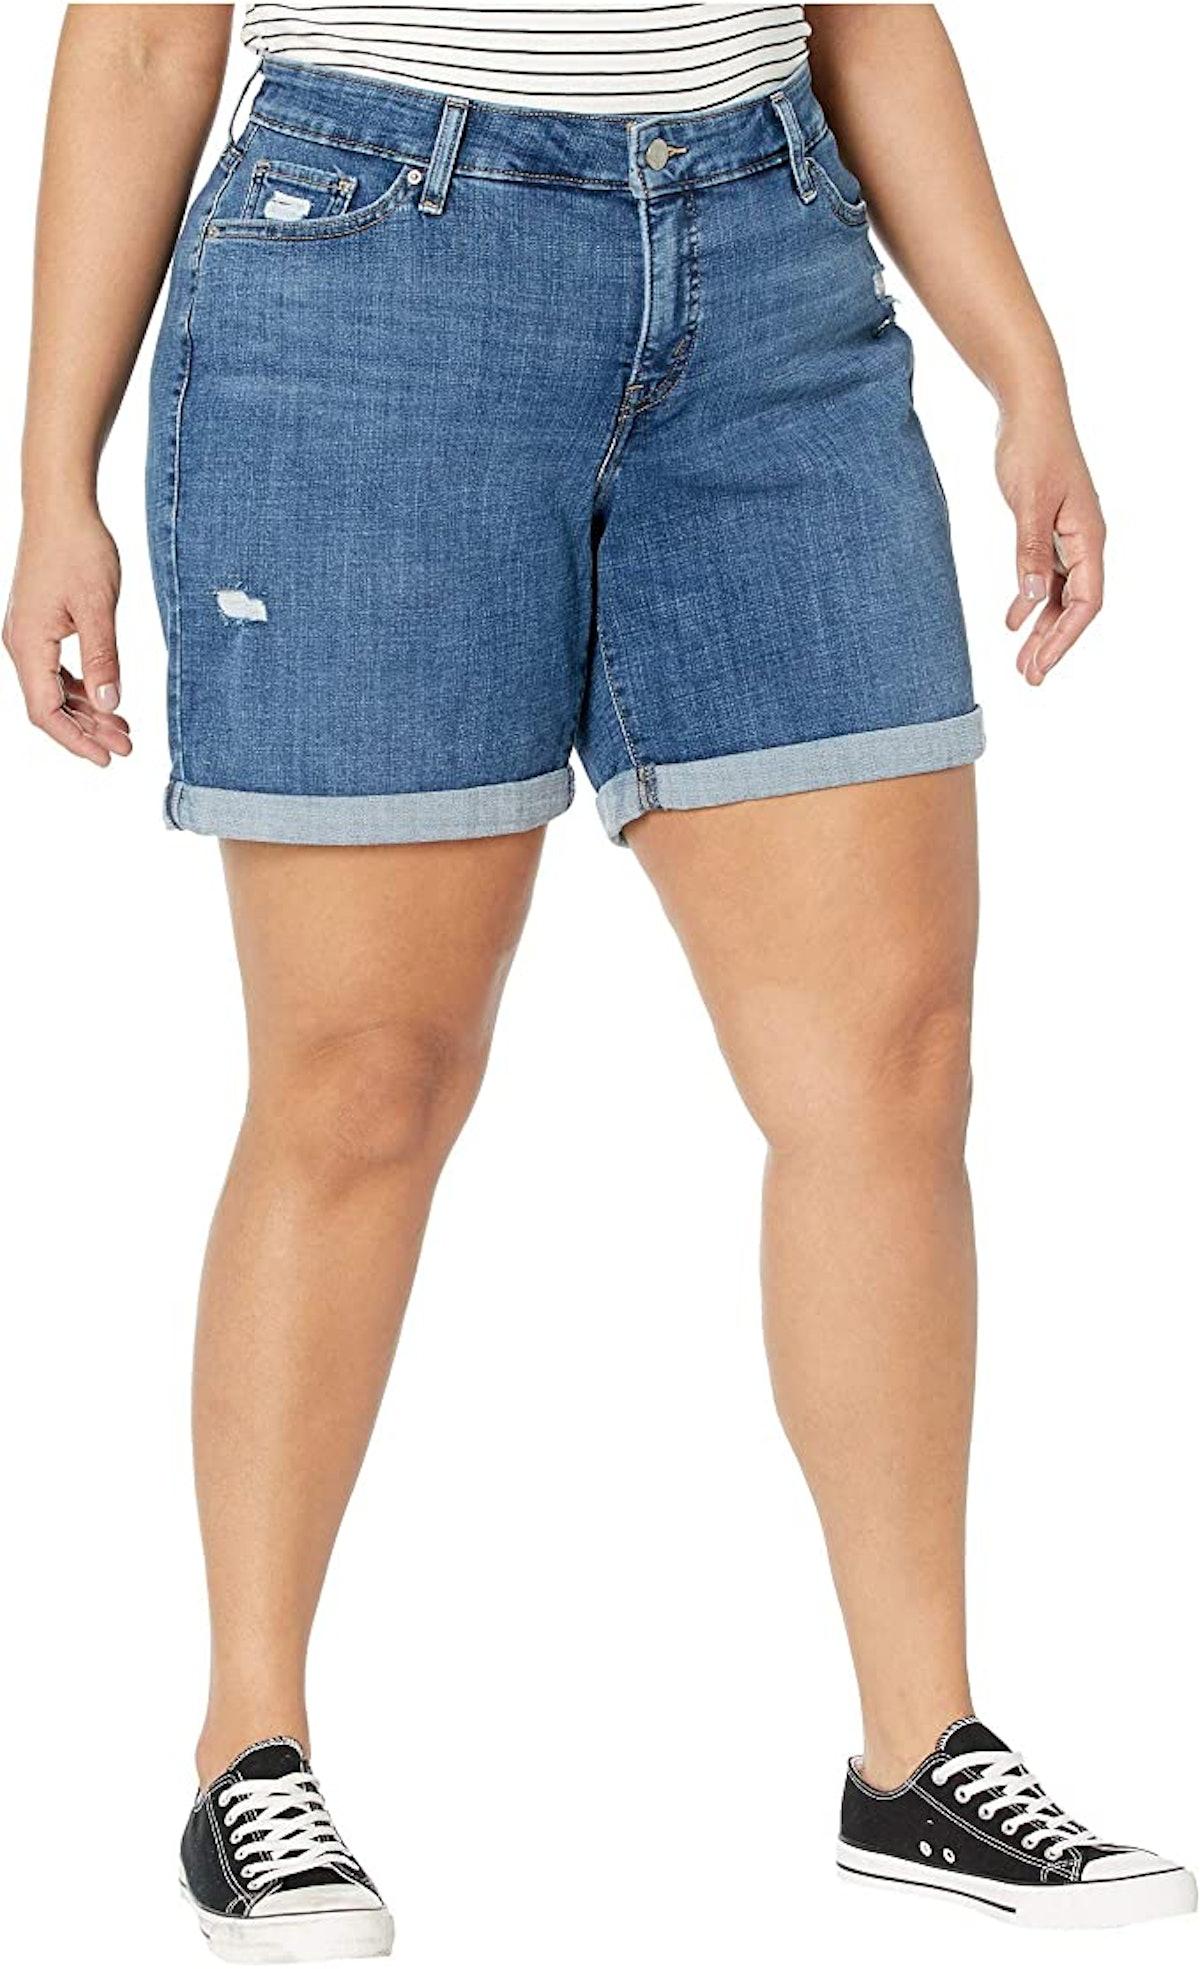 Levi's Plus Size New Shorts